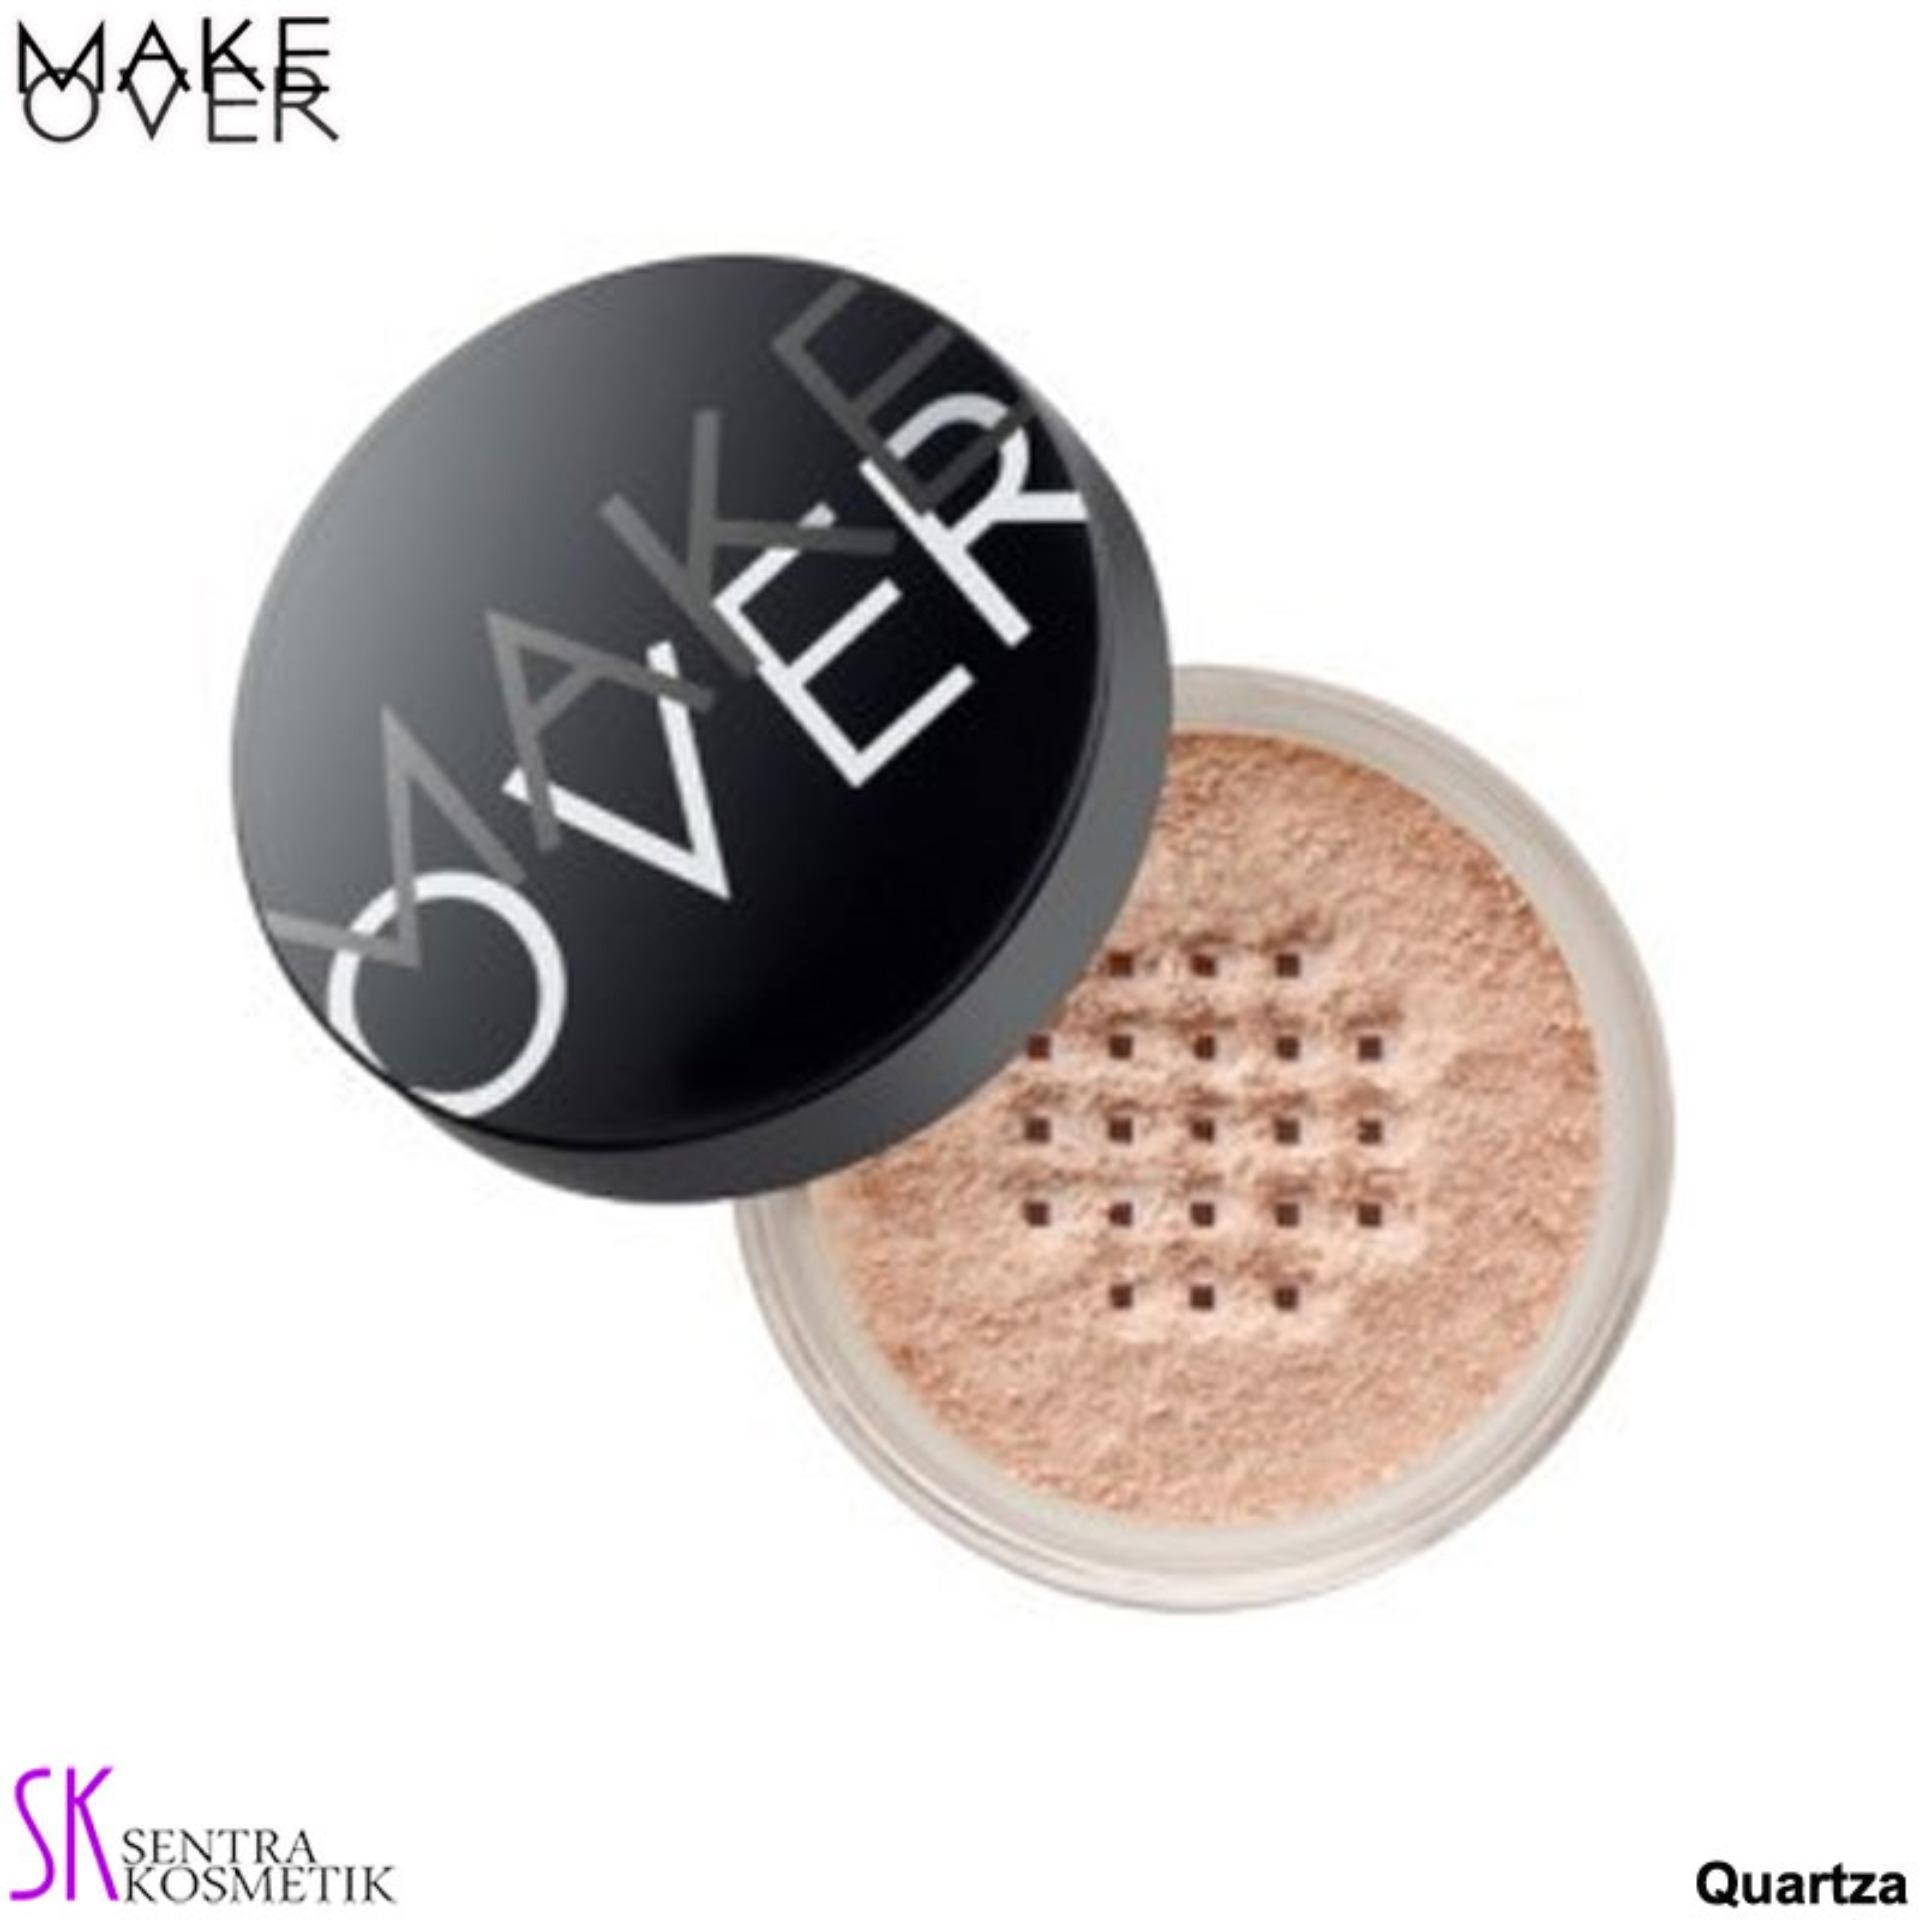 MAKE OVER Shimmering Powder Quartza - 24gr